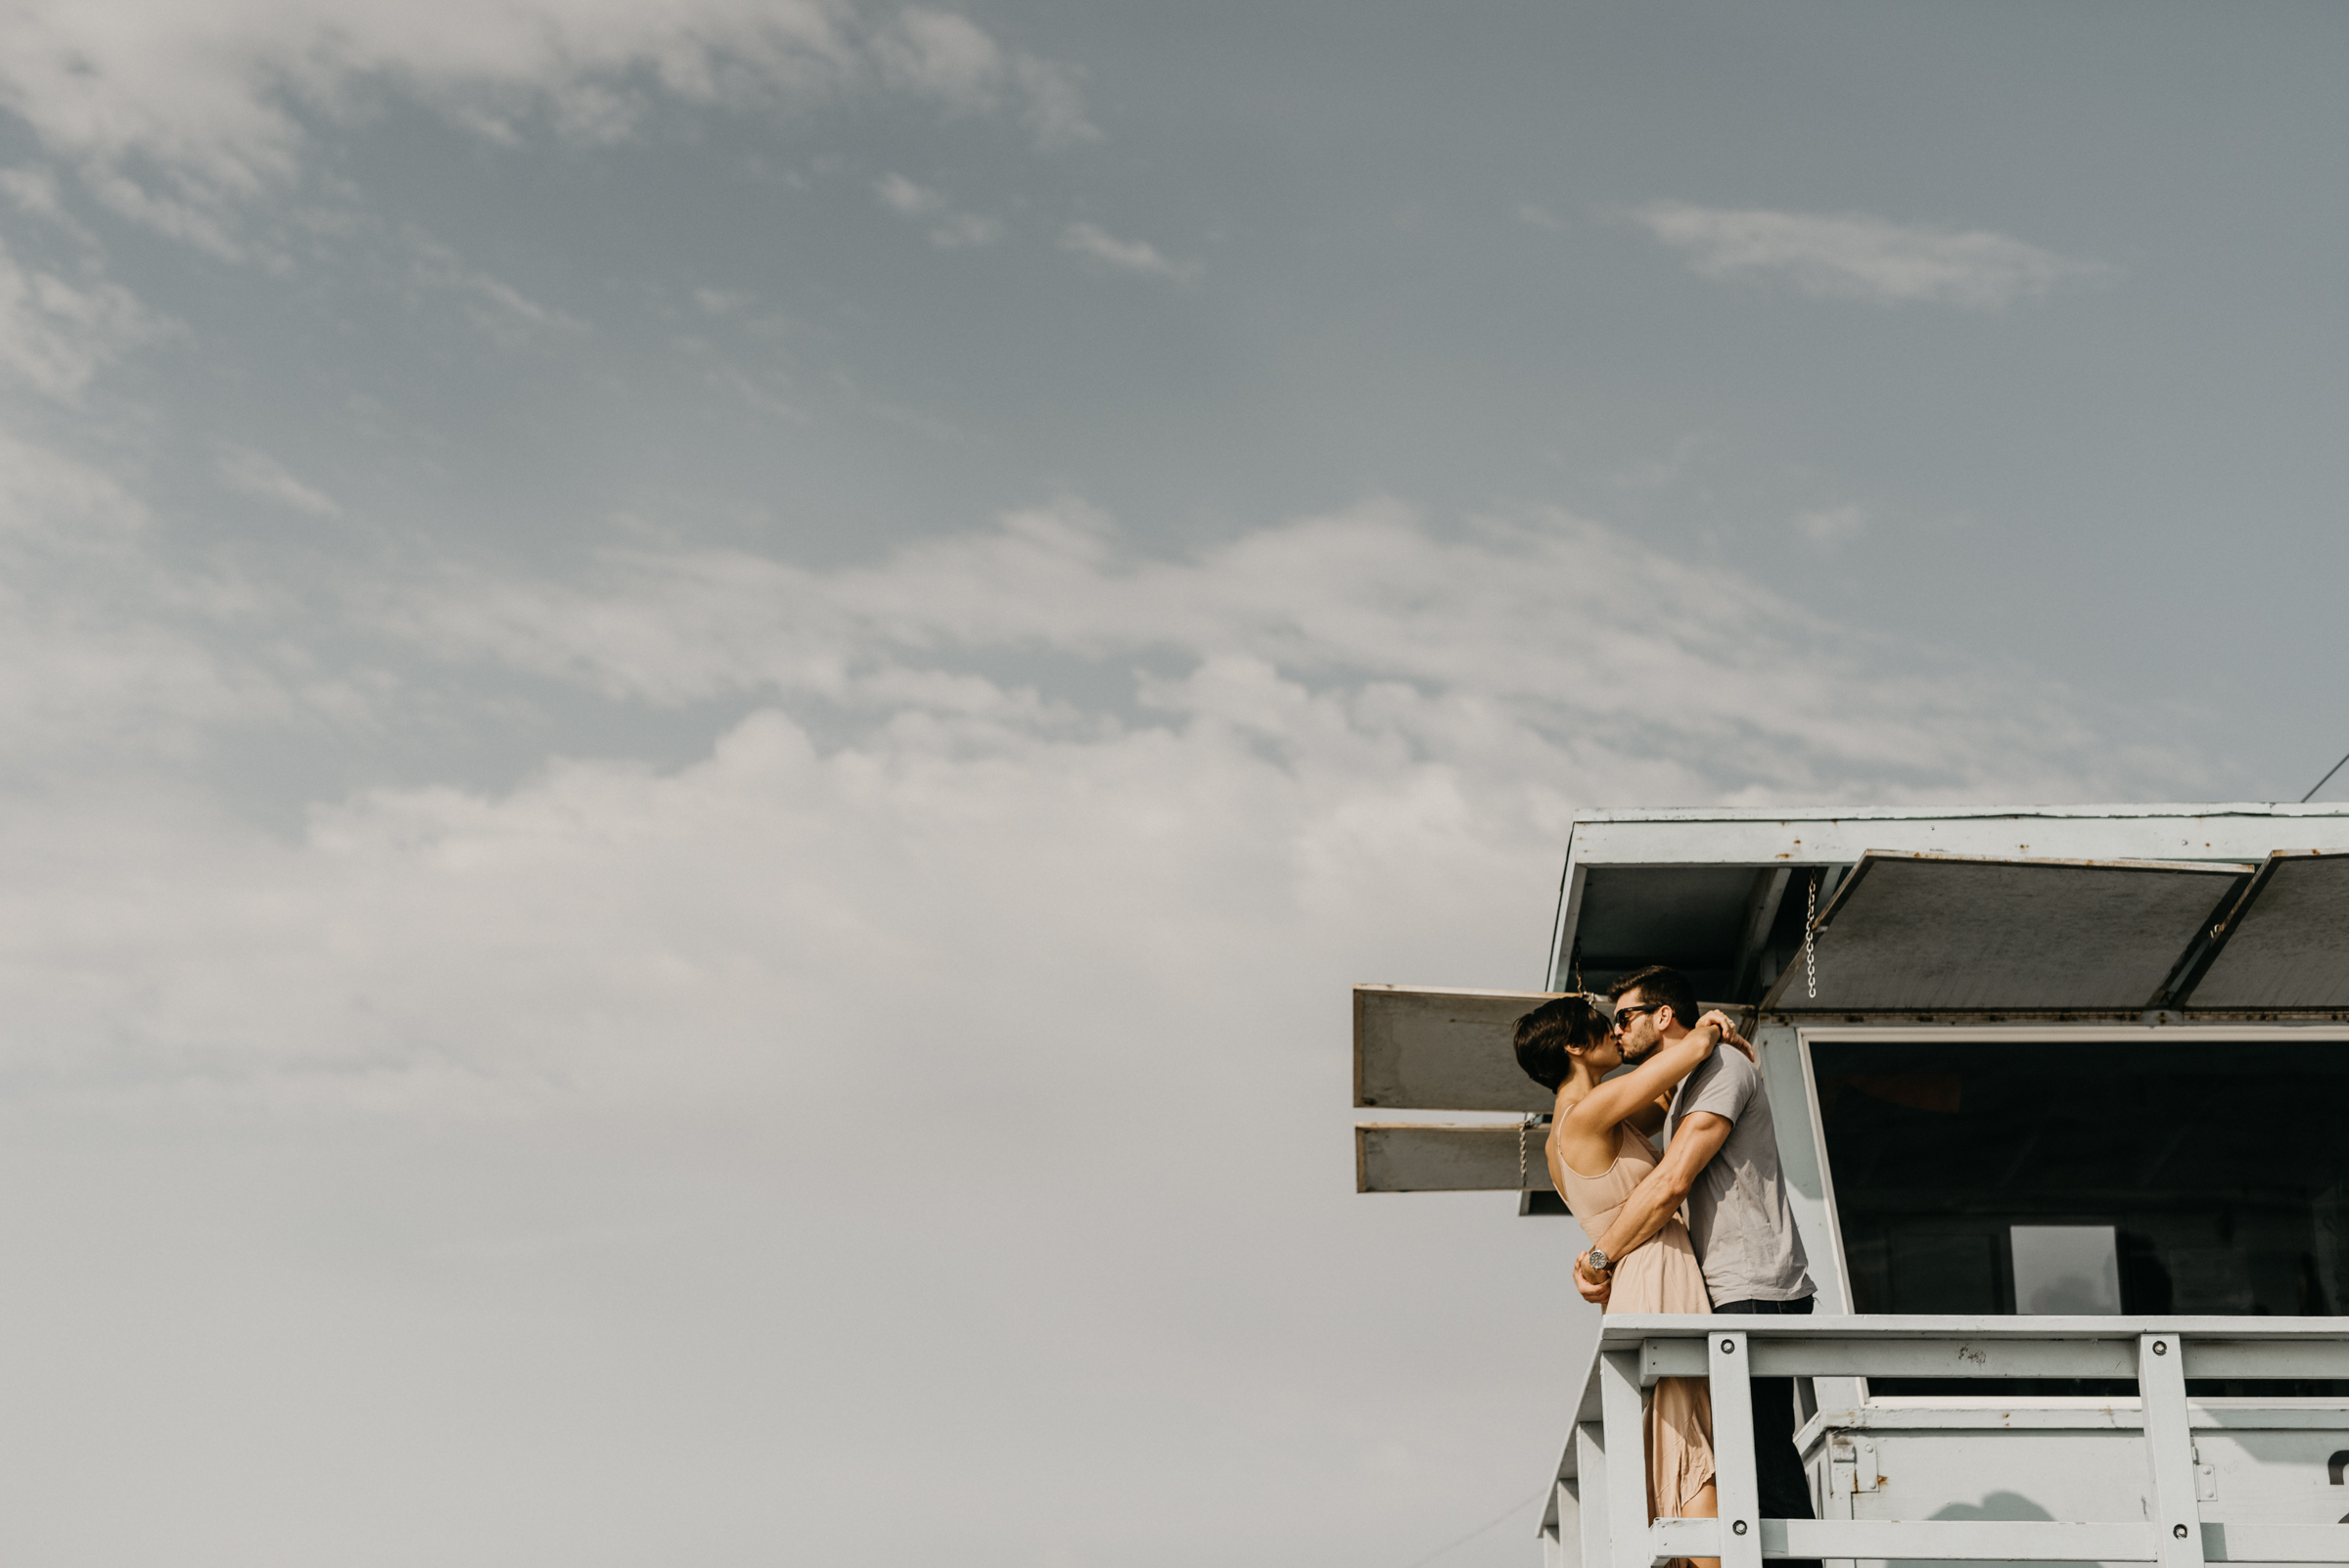 Isaiah + Taylor Photography - Venice Beach & Santa Monica Engagement Session, Los Angeles Wedding Photographer-064.jpg